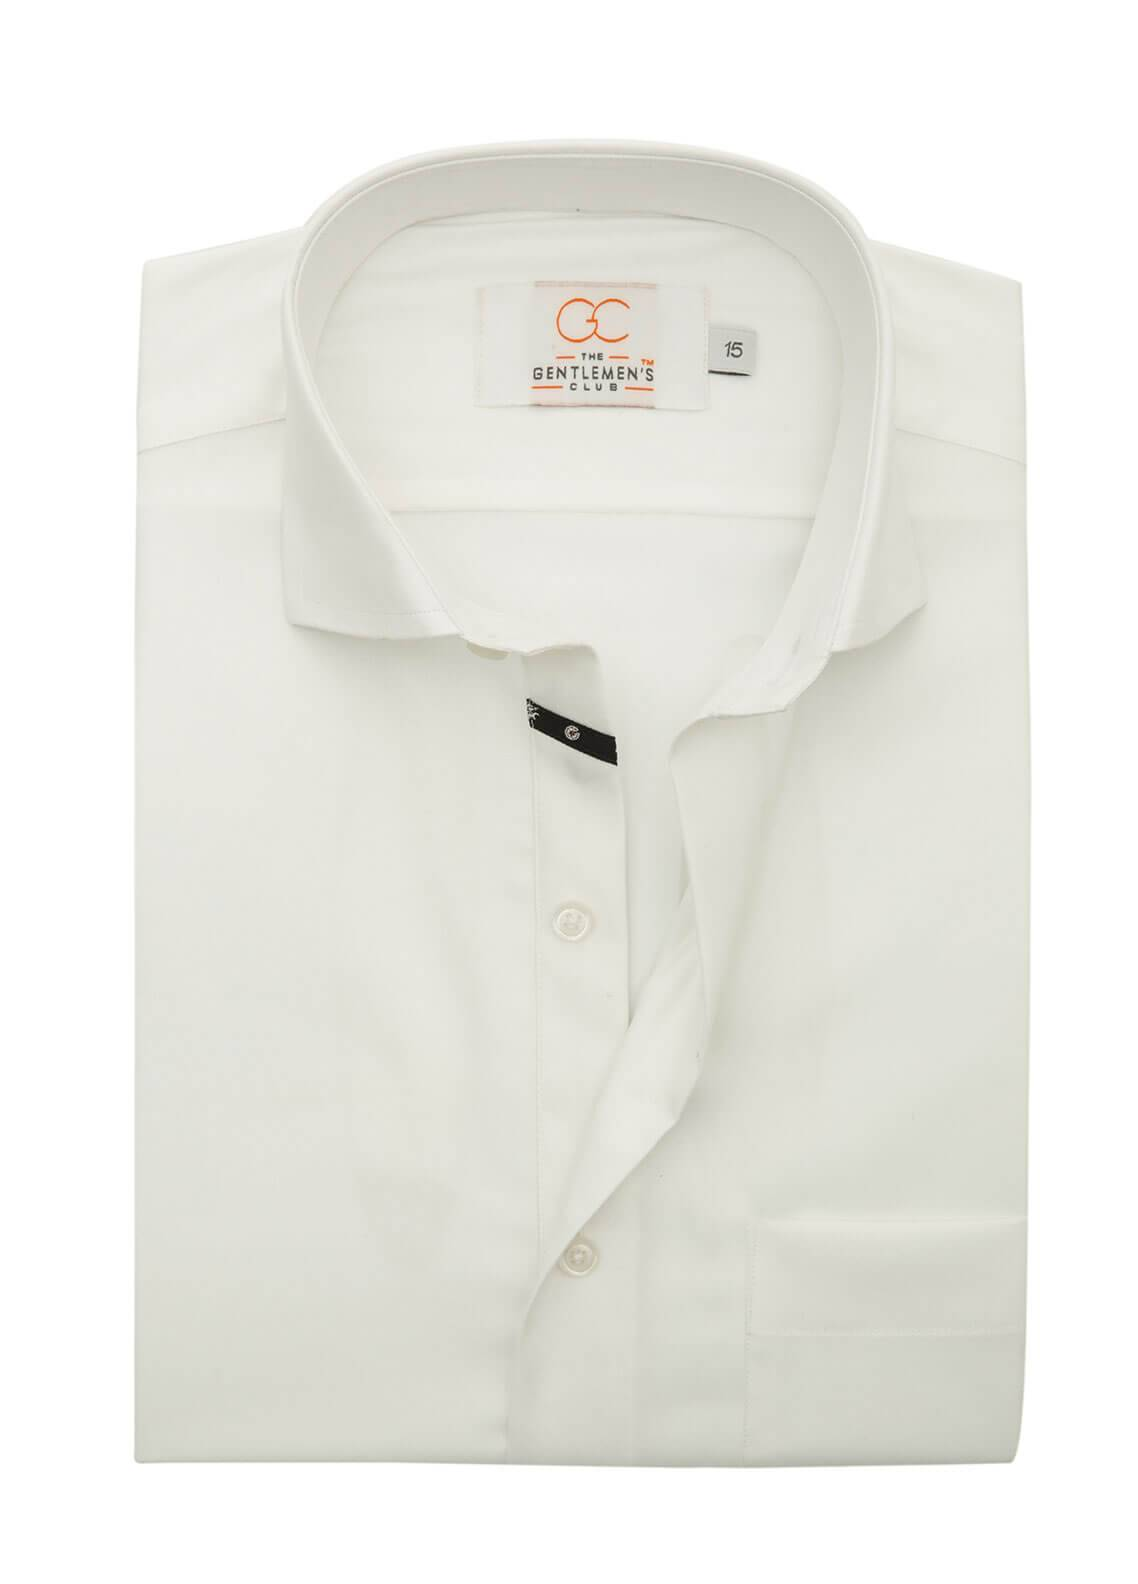 The Gentlemen's Club Cotton Formal Shirts for Men - White White Label 4089 - 18.5